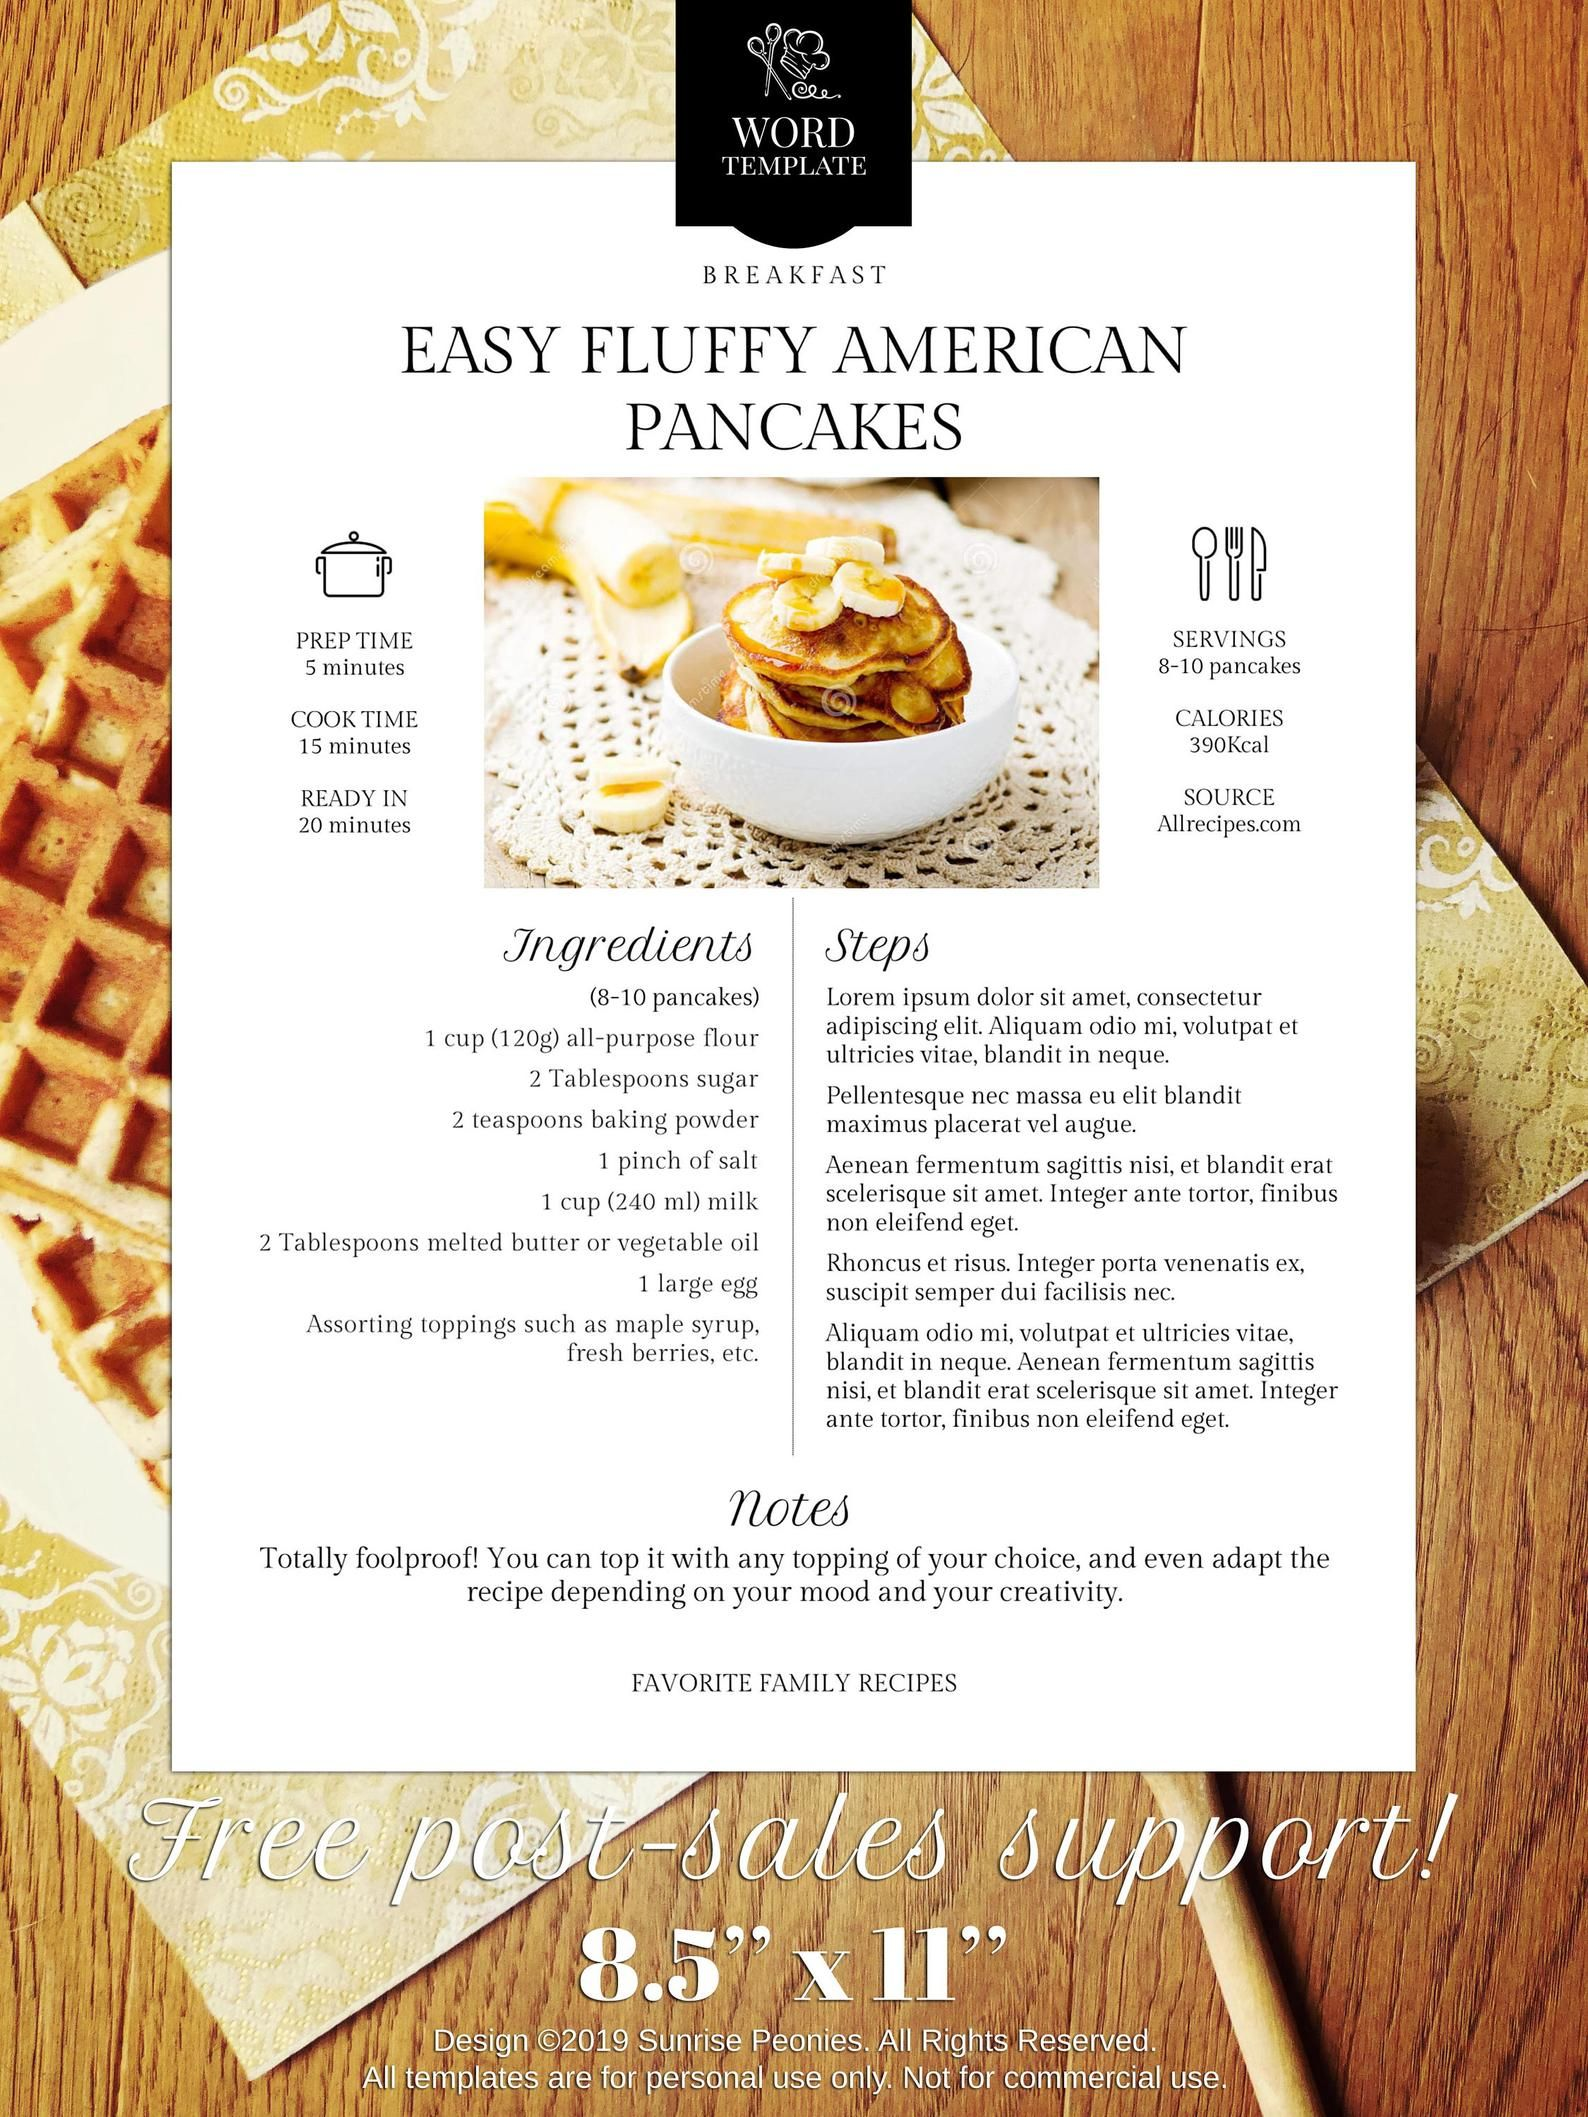 Best Seller Modern Cookbook Recipe Template Design 036 Etsy Homemade Recipe Books Homemade Cookbook Recipe Template